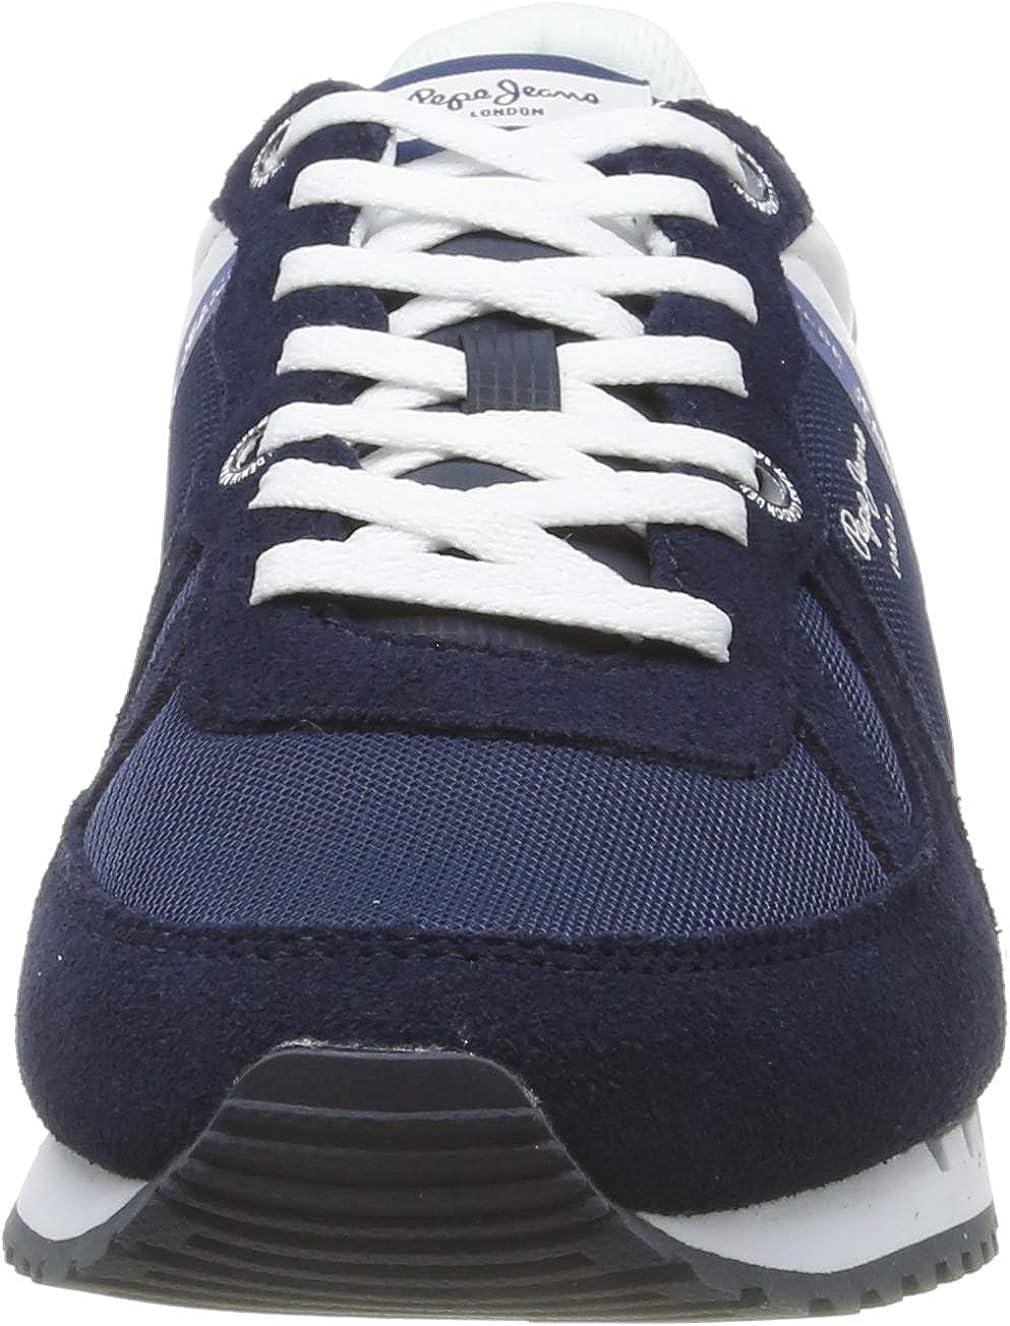 Pepe Jeans Tinker Zero Seal, Baskets Homme Bleu 582midnight 582